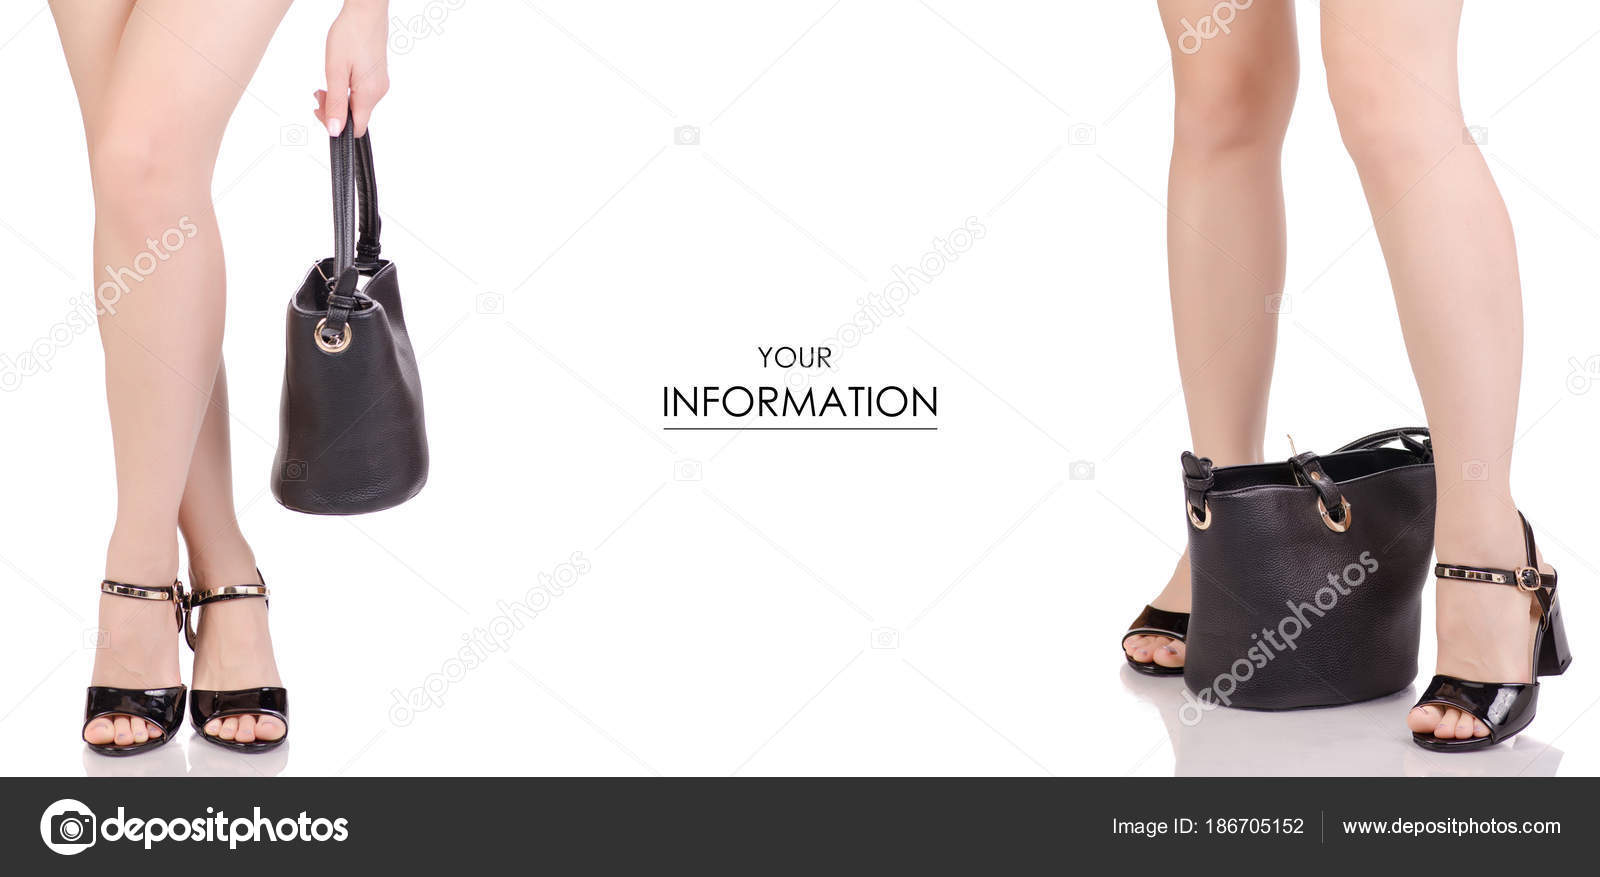 d2a2c8fef83 Γυναικεία πόδια σε μαύρη λάκα παπούτσια Πέδιλα και τσάντα μαύρο δέρμα  ομορφιά μόδα αγοράσει κατάστημα σετ μοτίβο σε λευκό φόντο απομόνωσης —  Εικόνα από ...